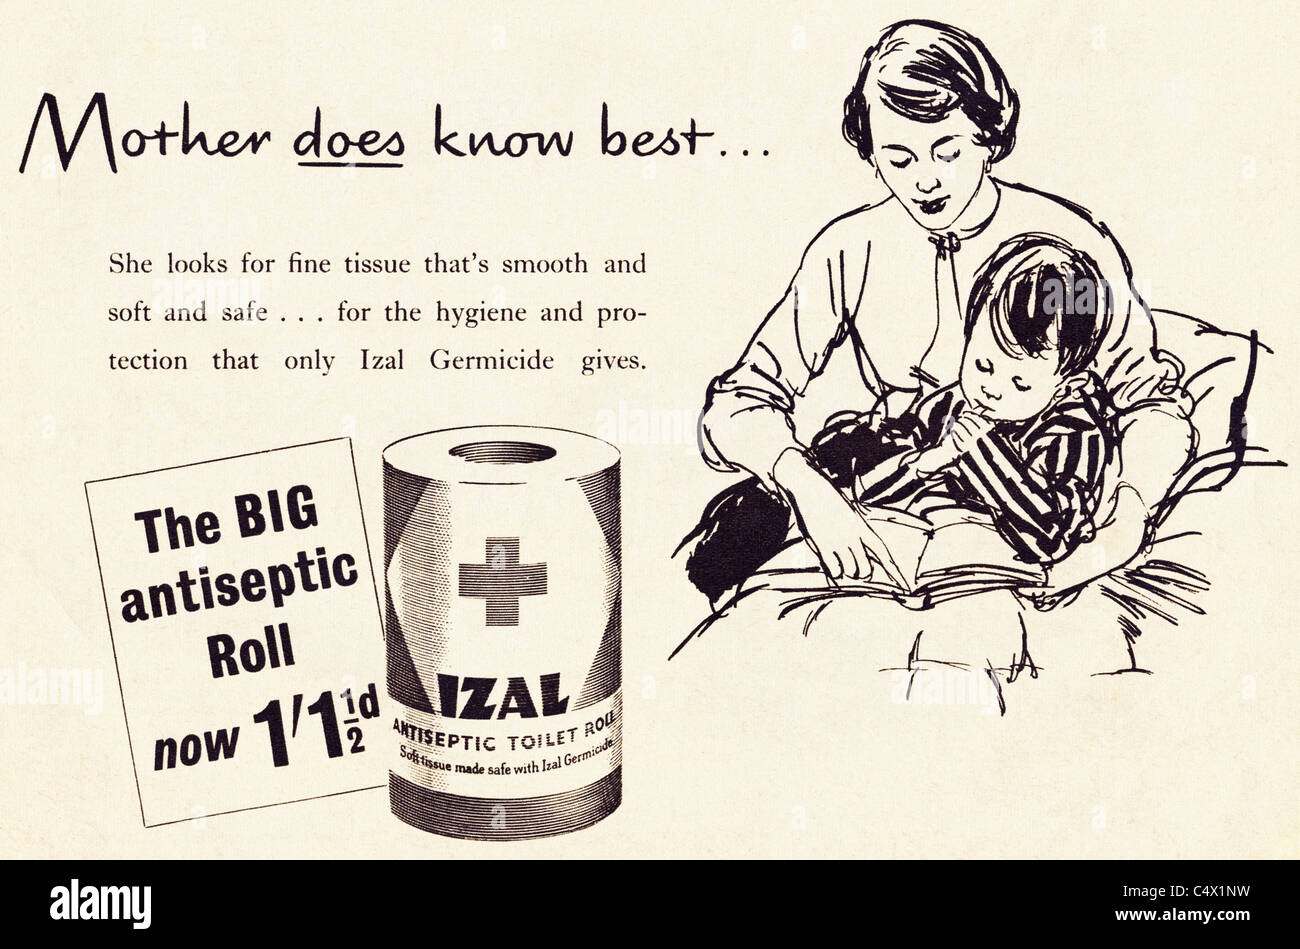 Original period advertisement in magazine circa 1953 advertising IZAL antiseptic toilet roll paper - Stock Image